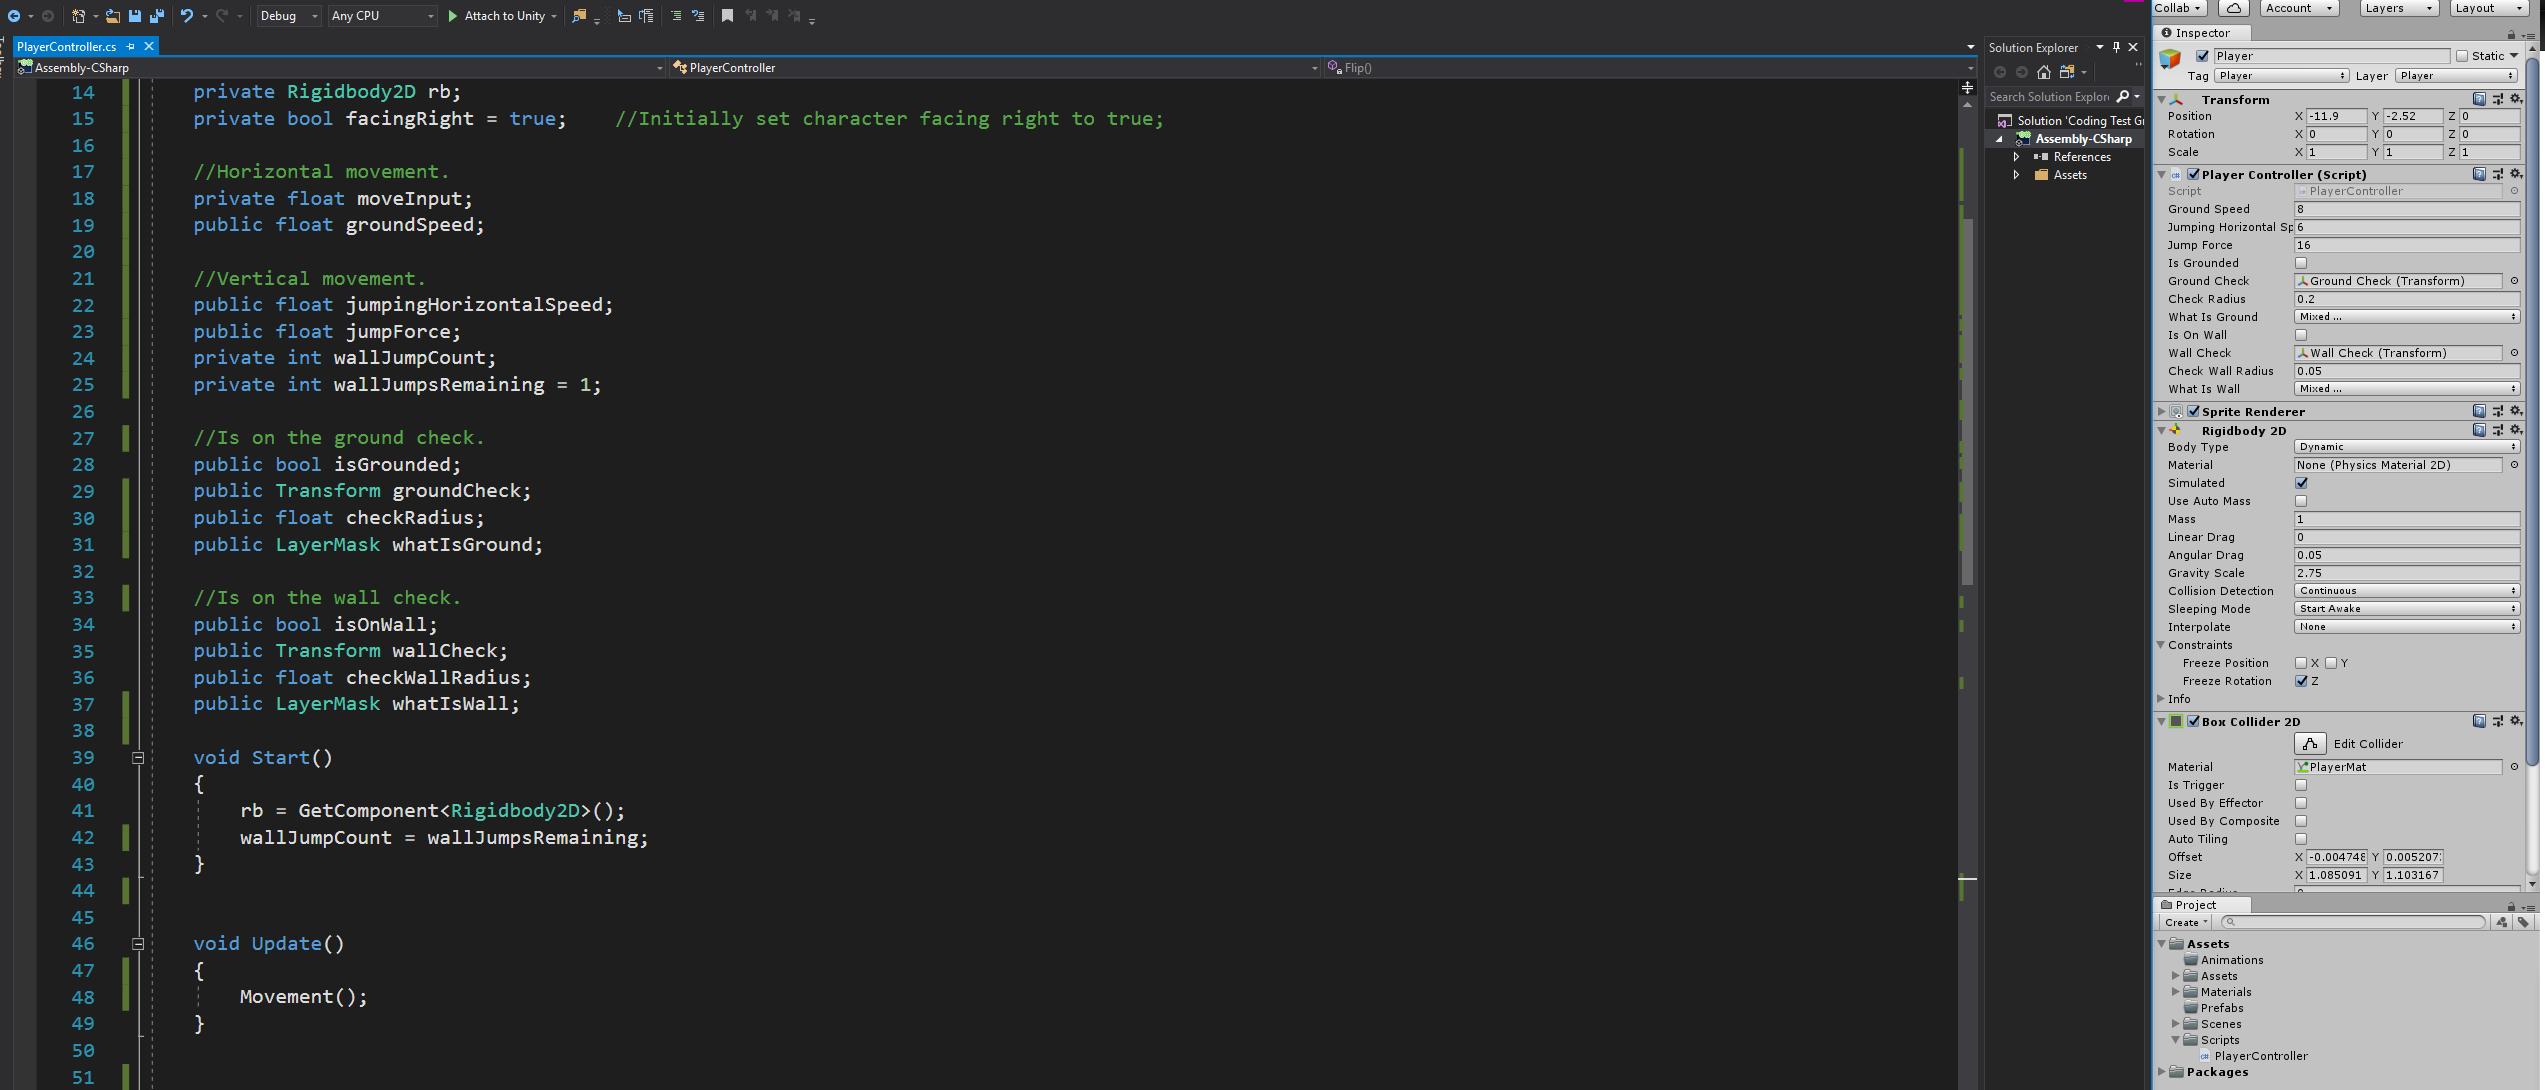 Need help implementing a 2D Platformer Dash Mechanic